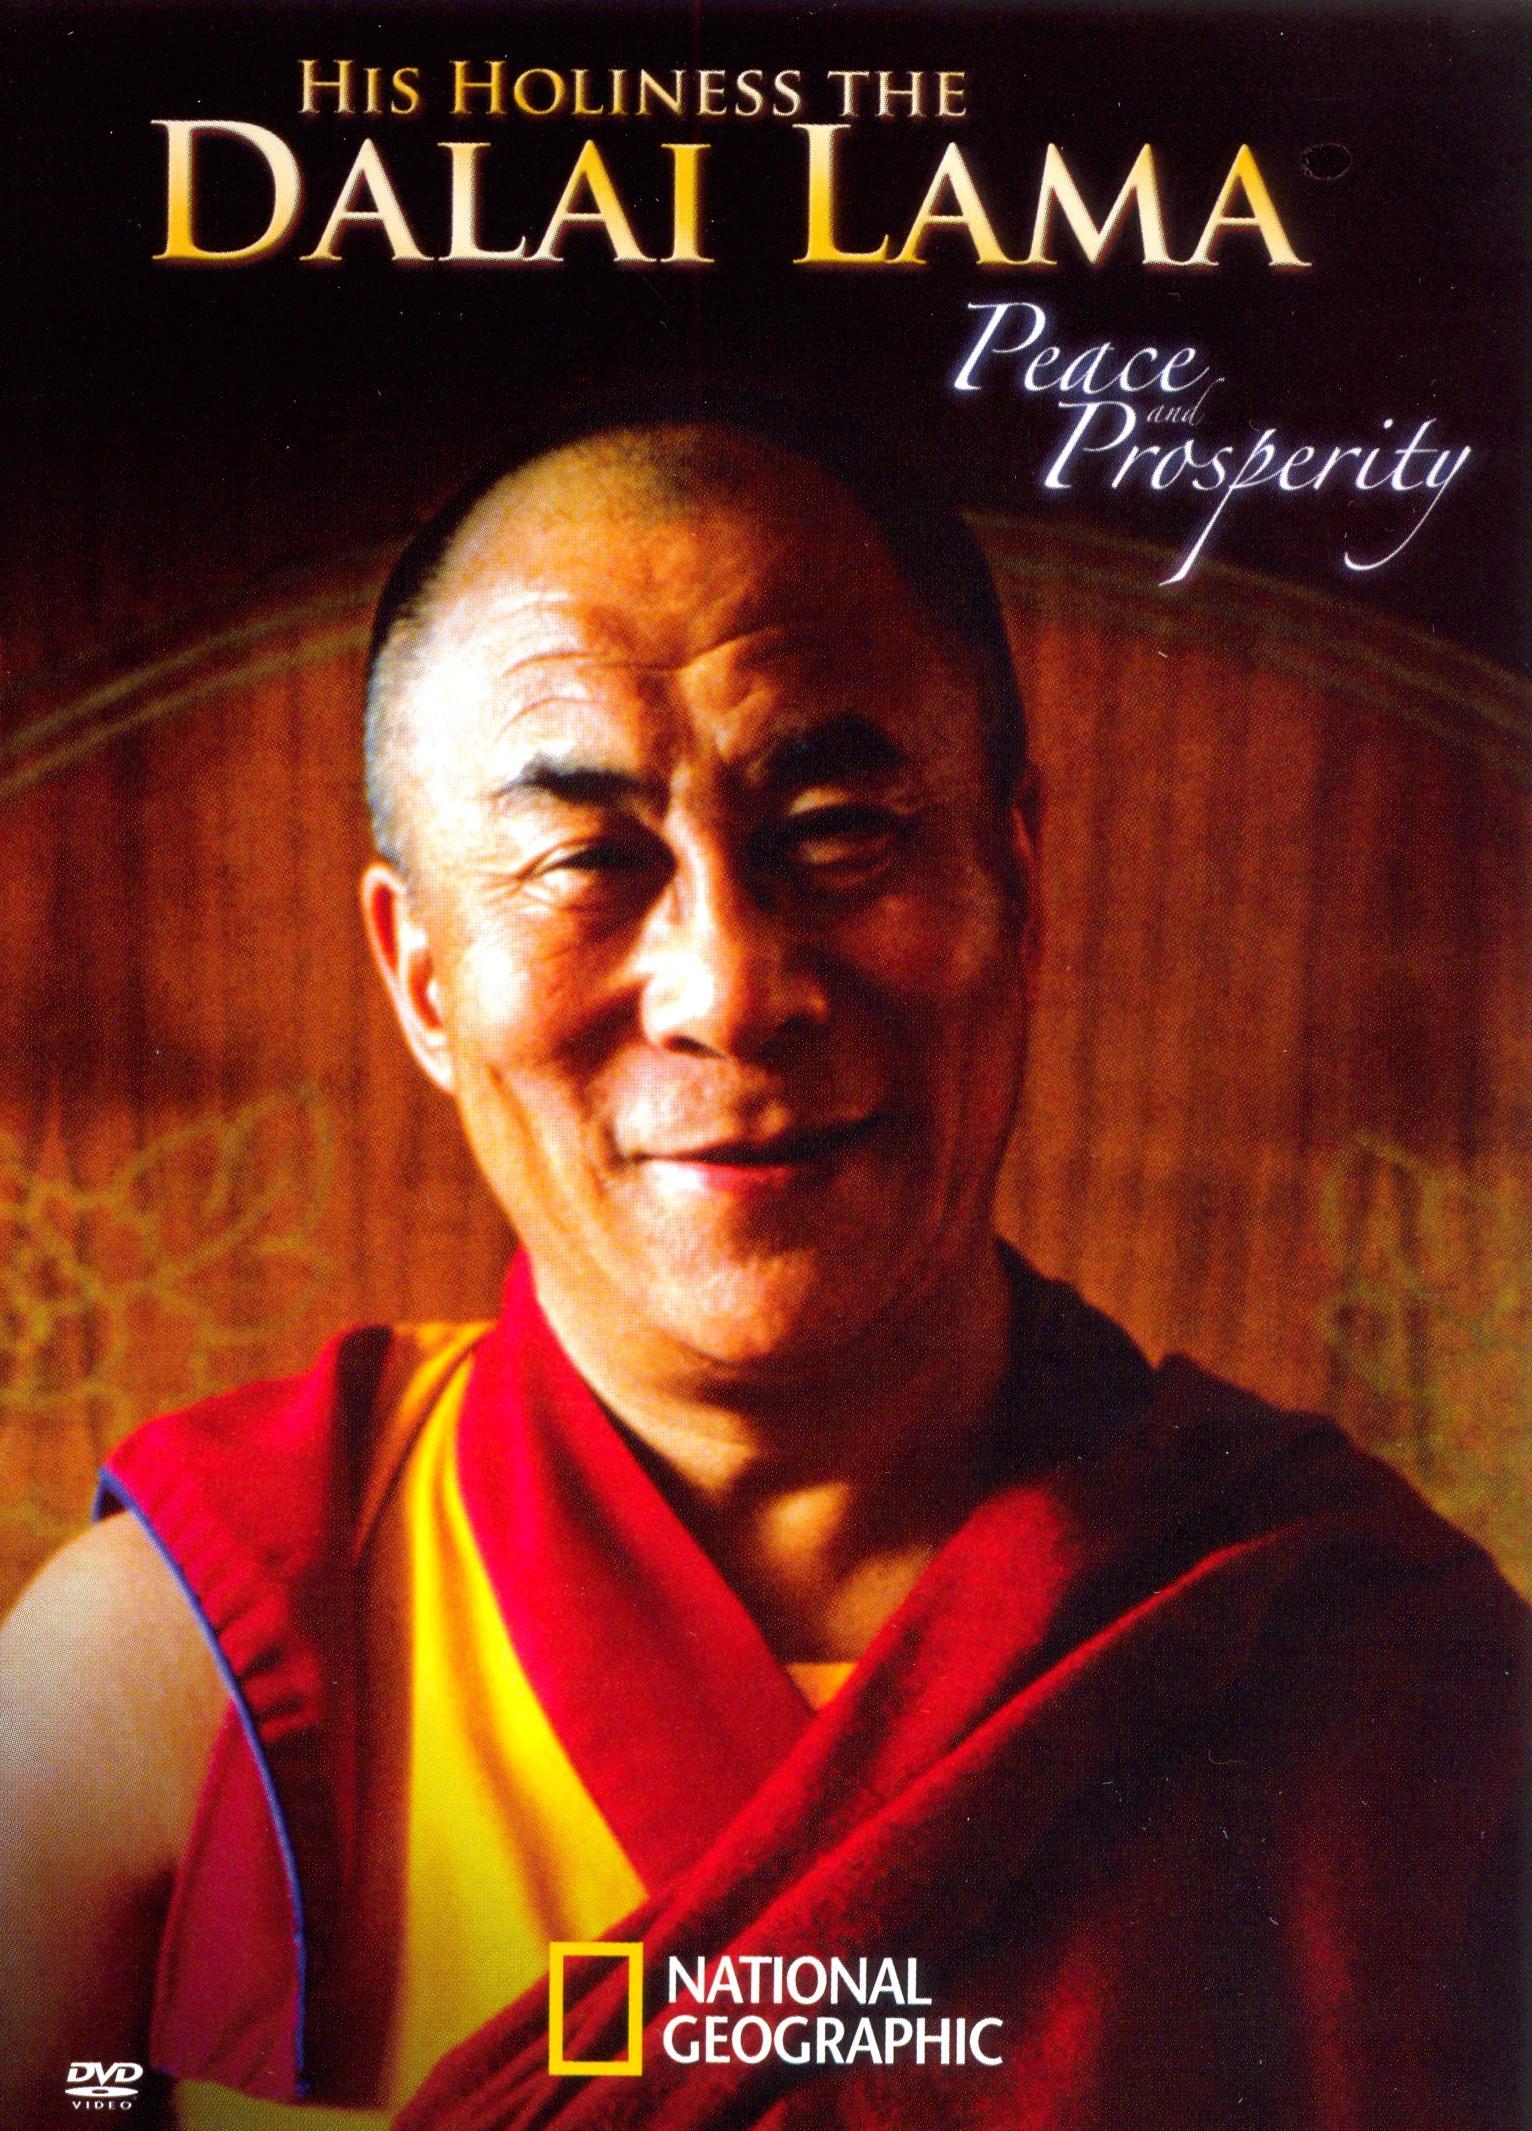 His Holiness the Dalai Lama Speaks: Peace and Prosperity (2007)